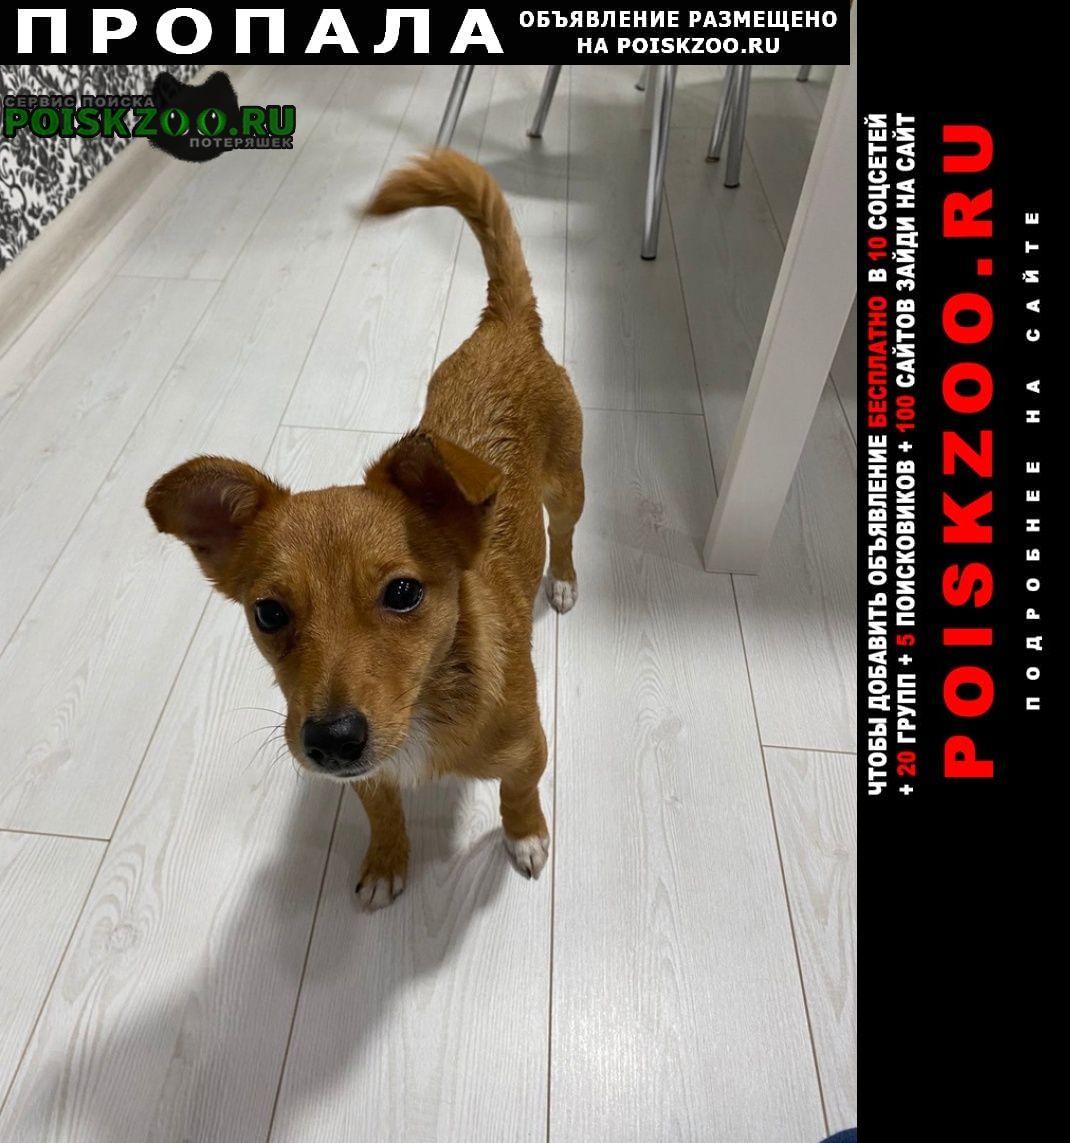 Гомель Пропала собака на фото собачка не наша, похожая